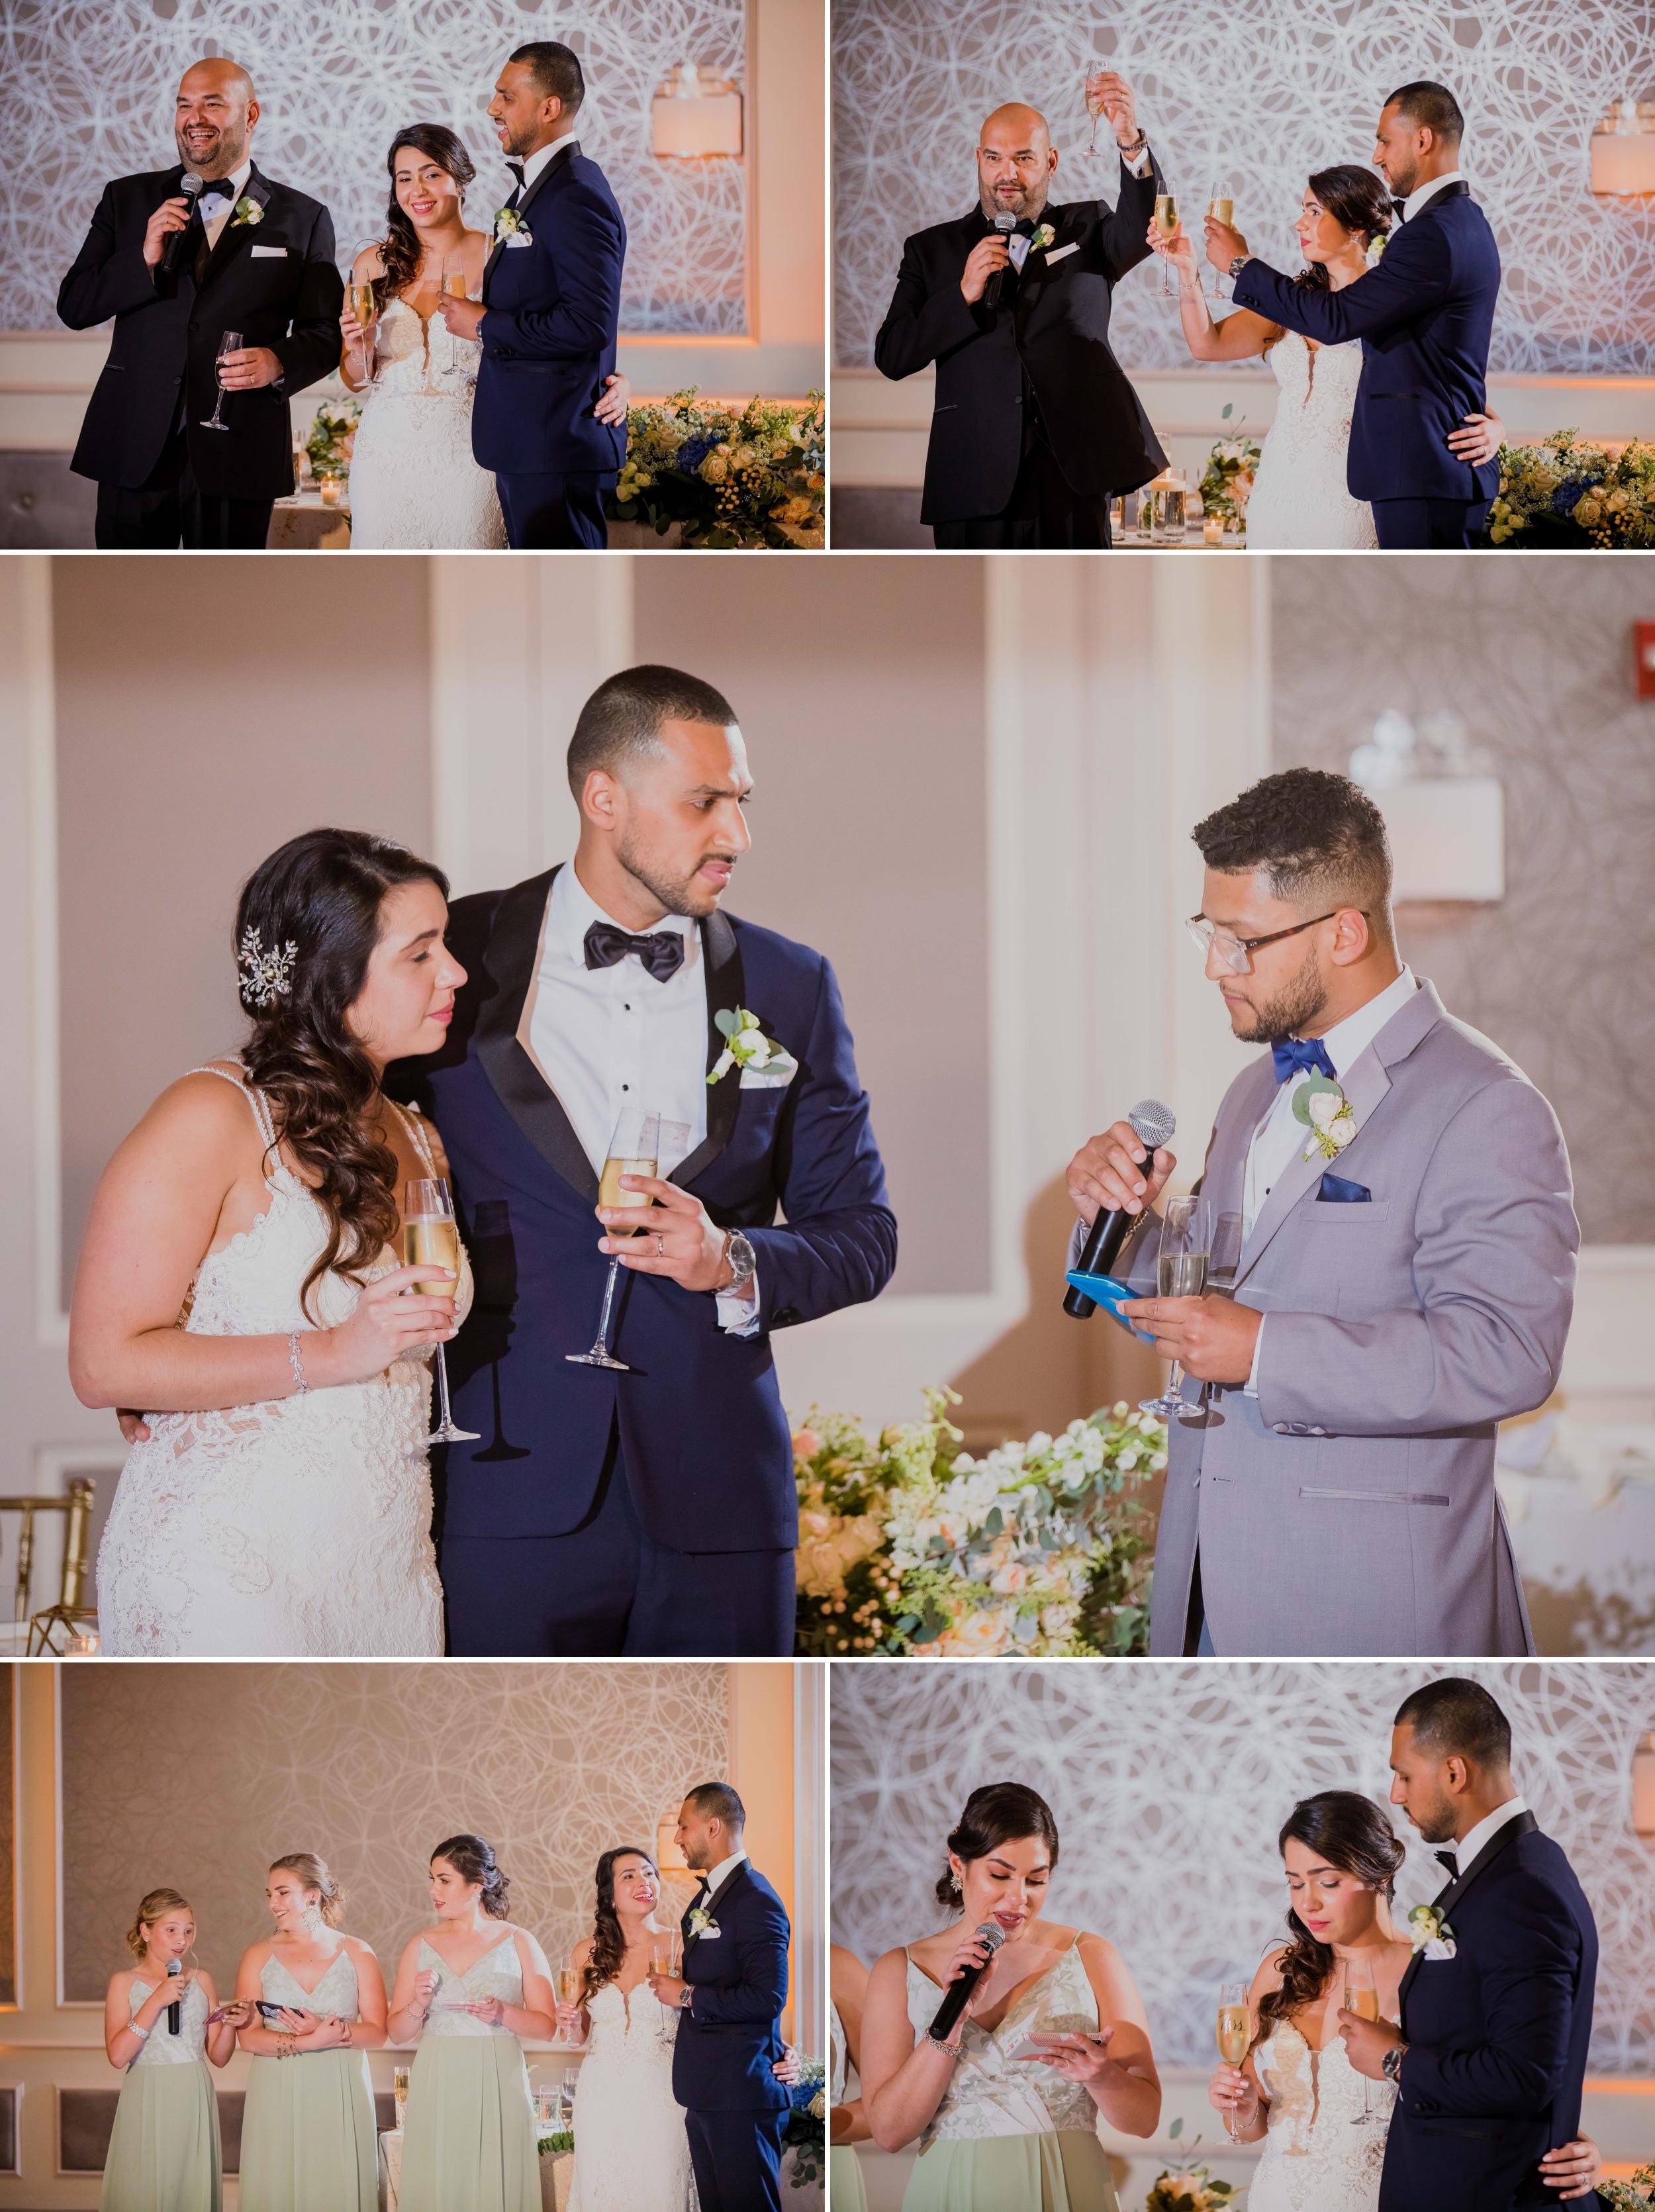 Wedding - Rusty Pelican - Key Biscayne - Santy Martinez Photography 41.jpg